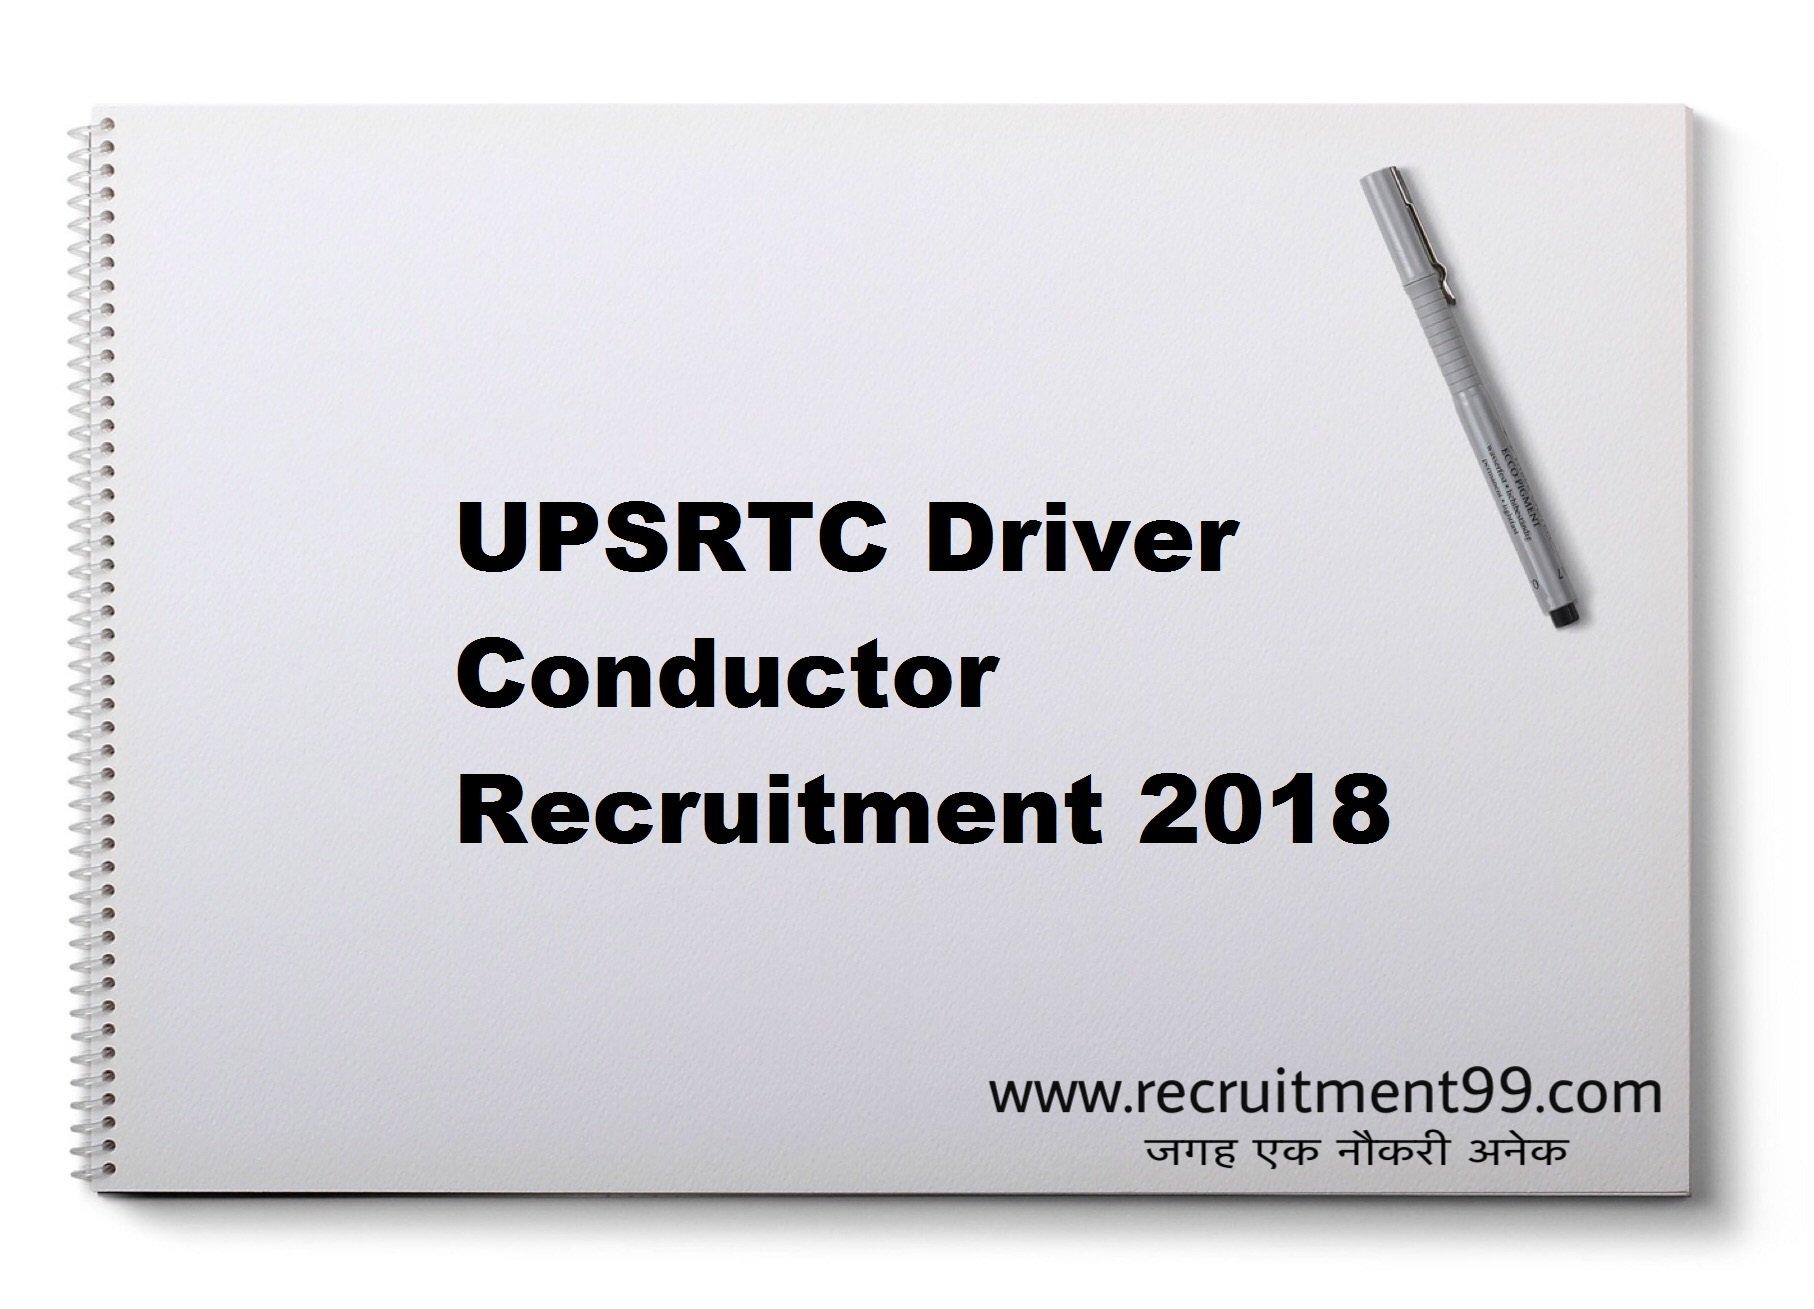 UPSRTC Driver Conductor Recruitment Admit Card Result 2018